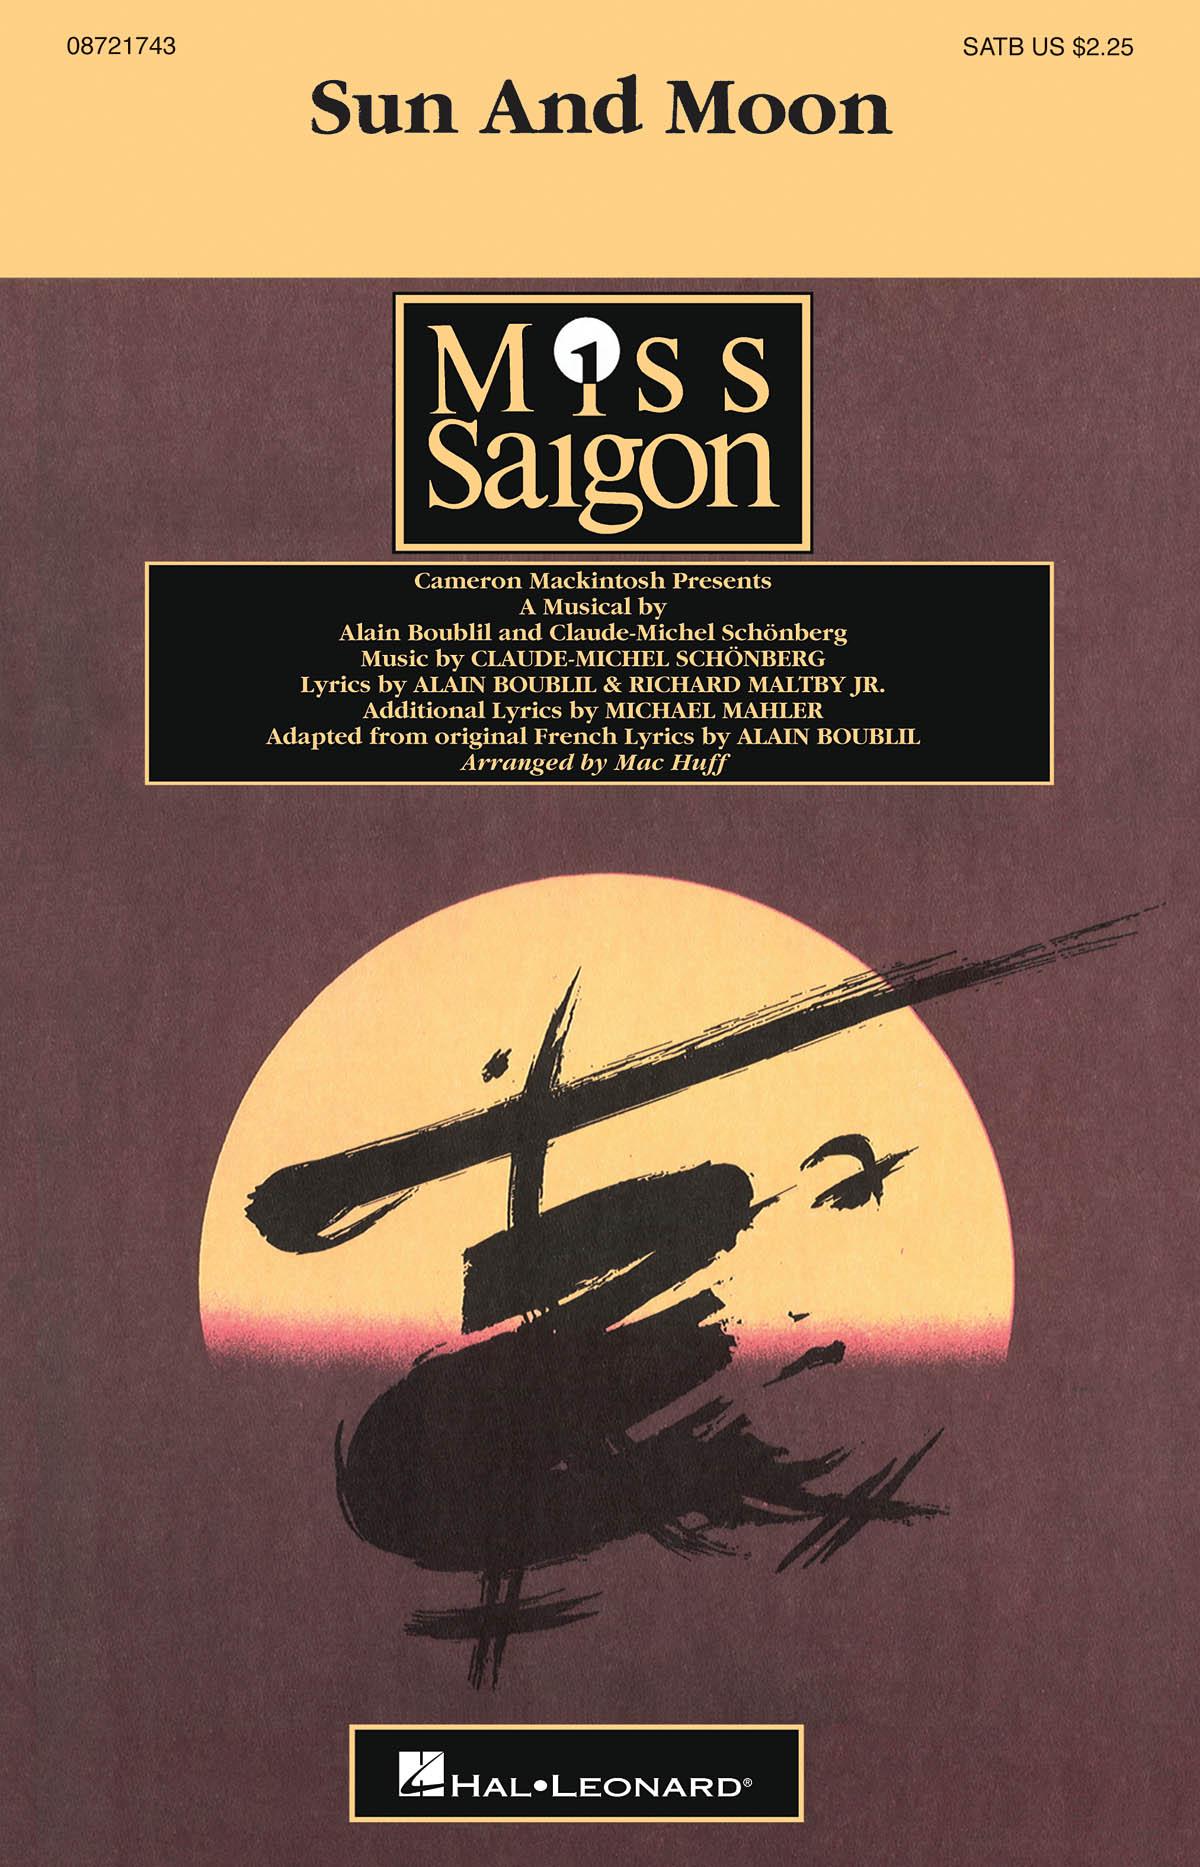 Alain Boublil Claude-Michel Schönberg Richard Maltby Jr.: Sun And Moon: SATB: